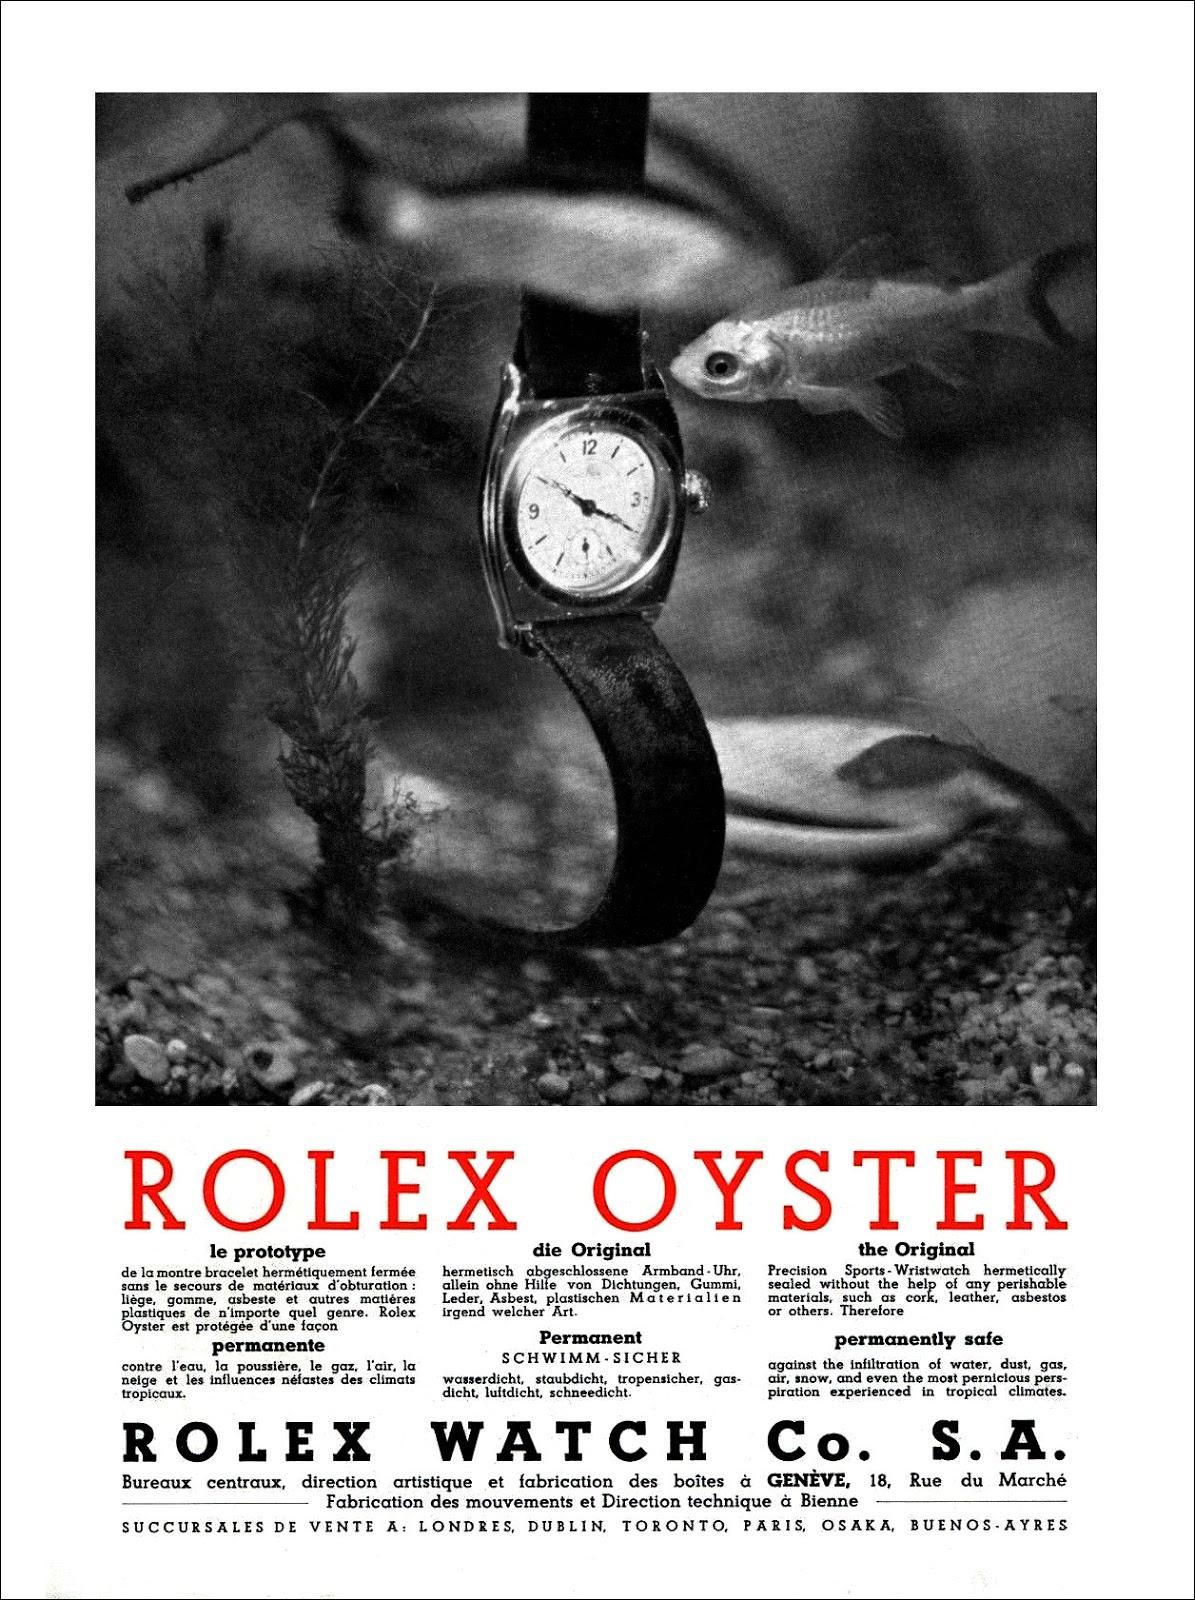 1936-rolex-oyster-fishtank-magazine-ad1